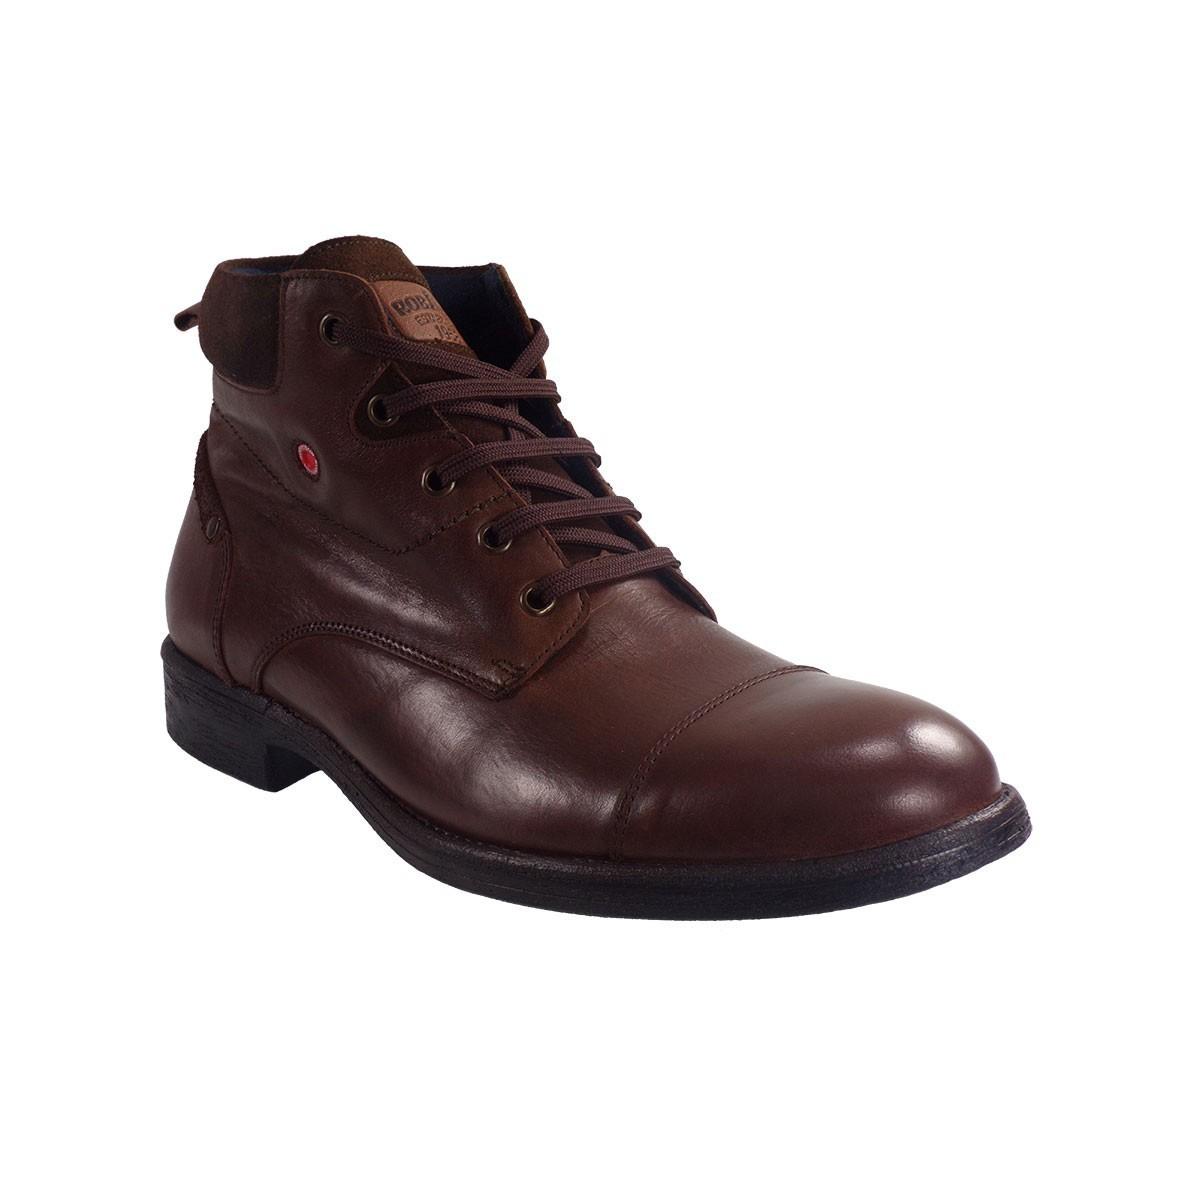 Robinson Ανδρικά Παπούτσια Μποτάκια Αρβυλάκια 1651 Καφέ Δέρμα